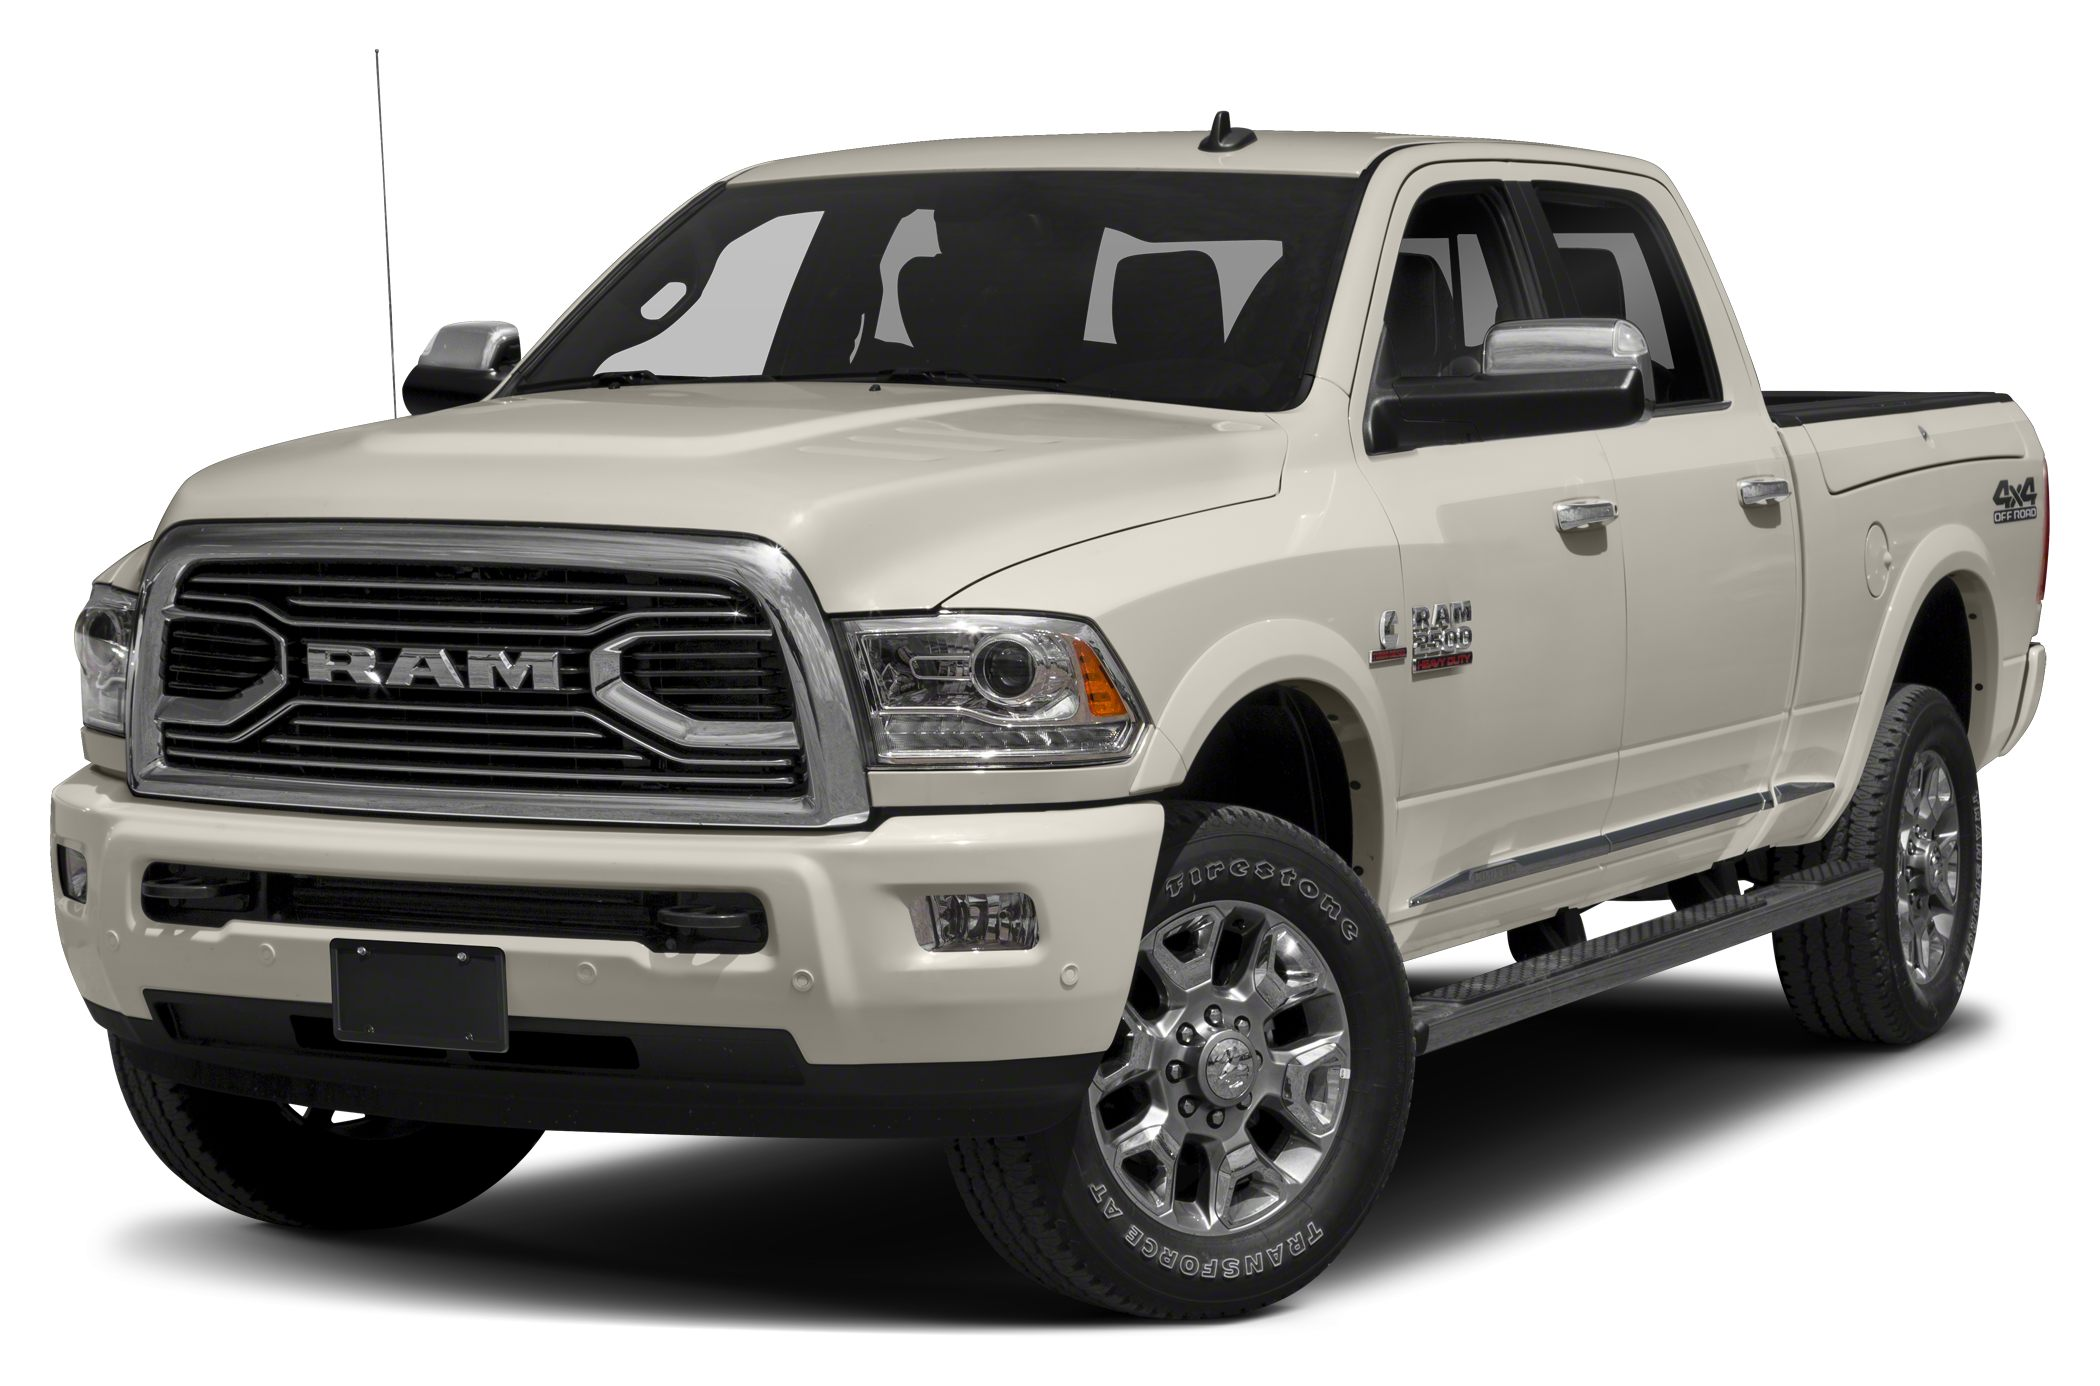 2018 RAM 2500 Longhorn New Price Crystal Metallic 2018 Ram 2500 Laramie Longhorn 4WD 6-Speed Auto